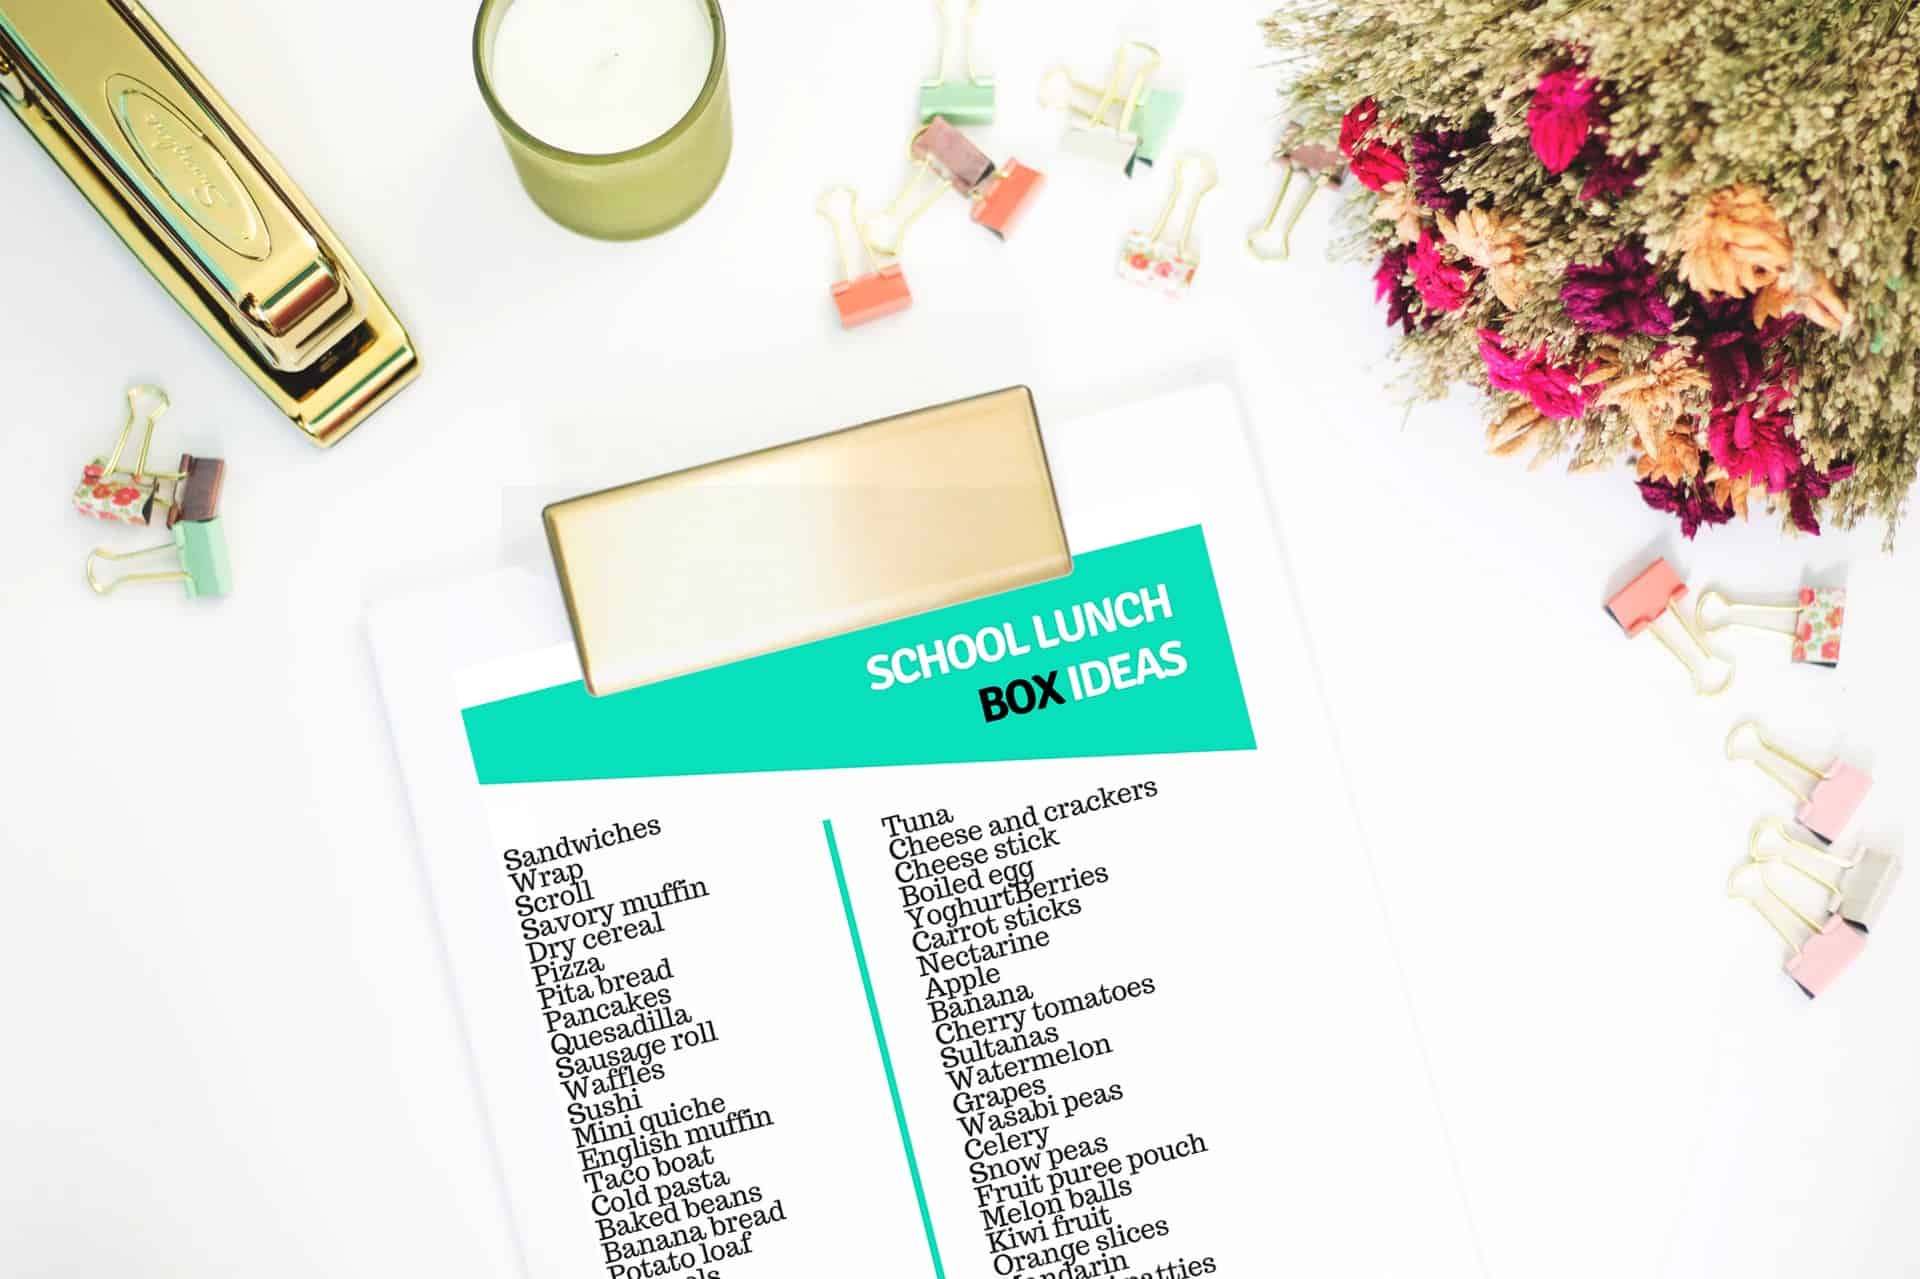 Lunch box ideas printable list